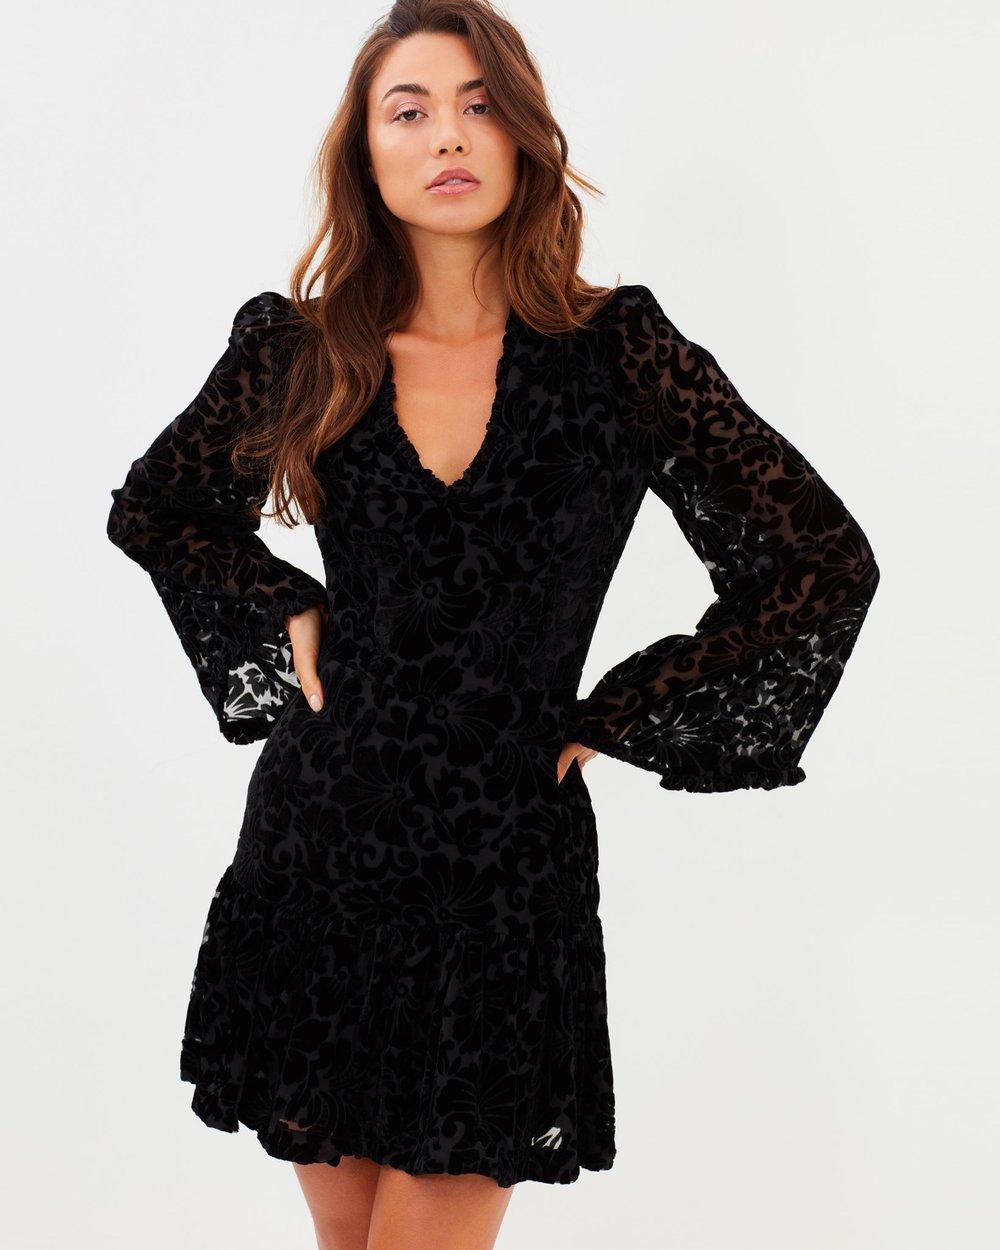 Venice Long Sleeve Mini Dress by Cooper St Online  fe8d49aa3